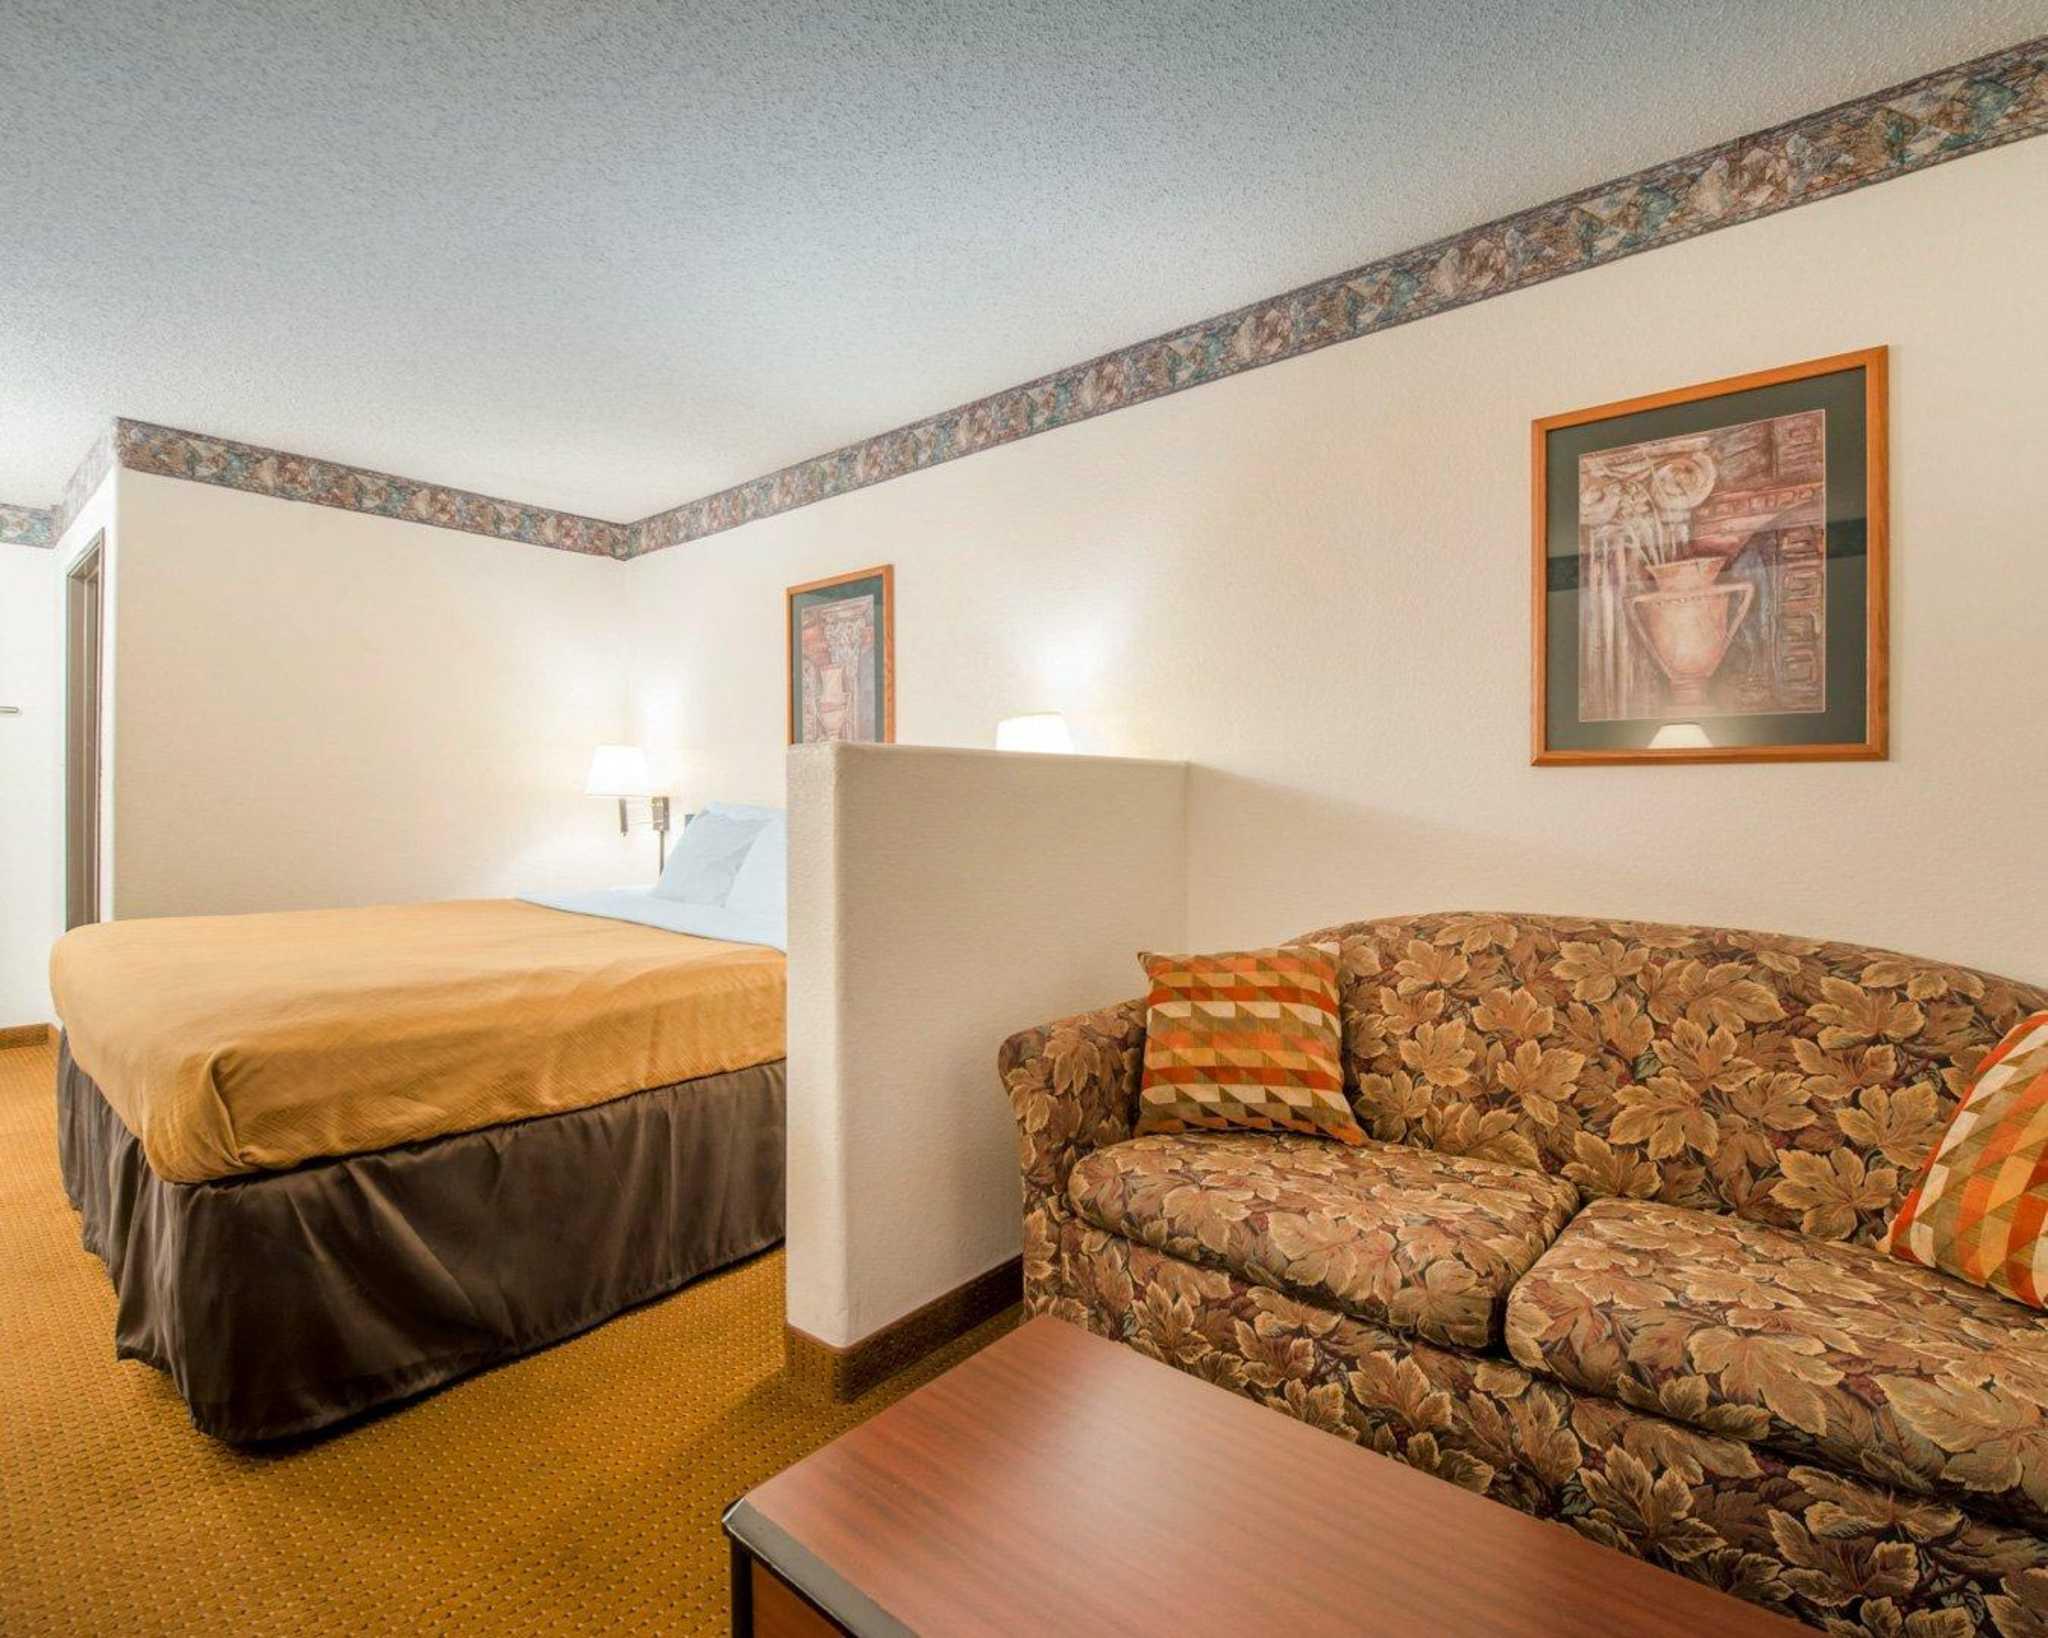 Econo Lodge image 11